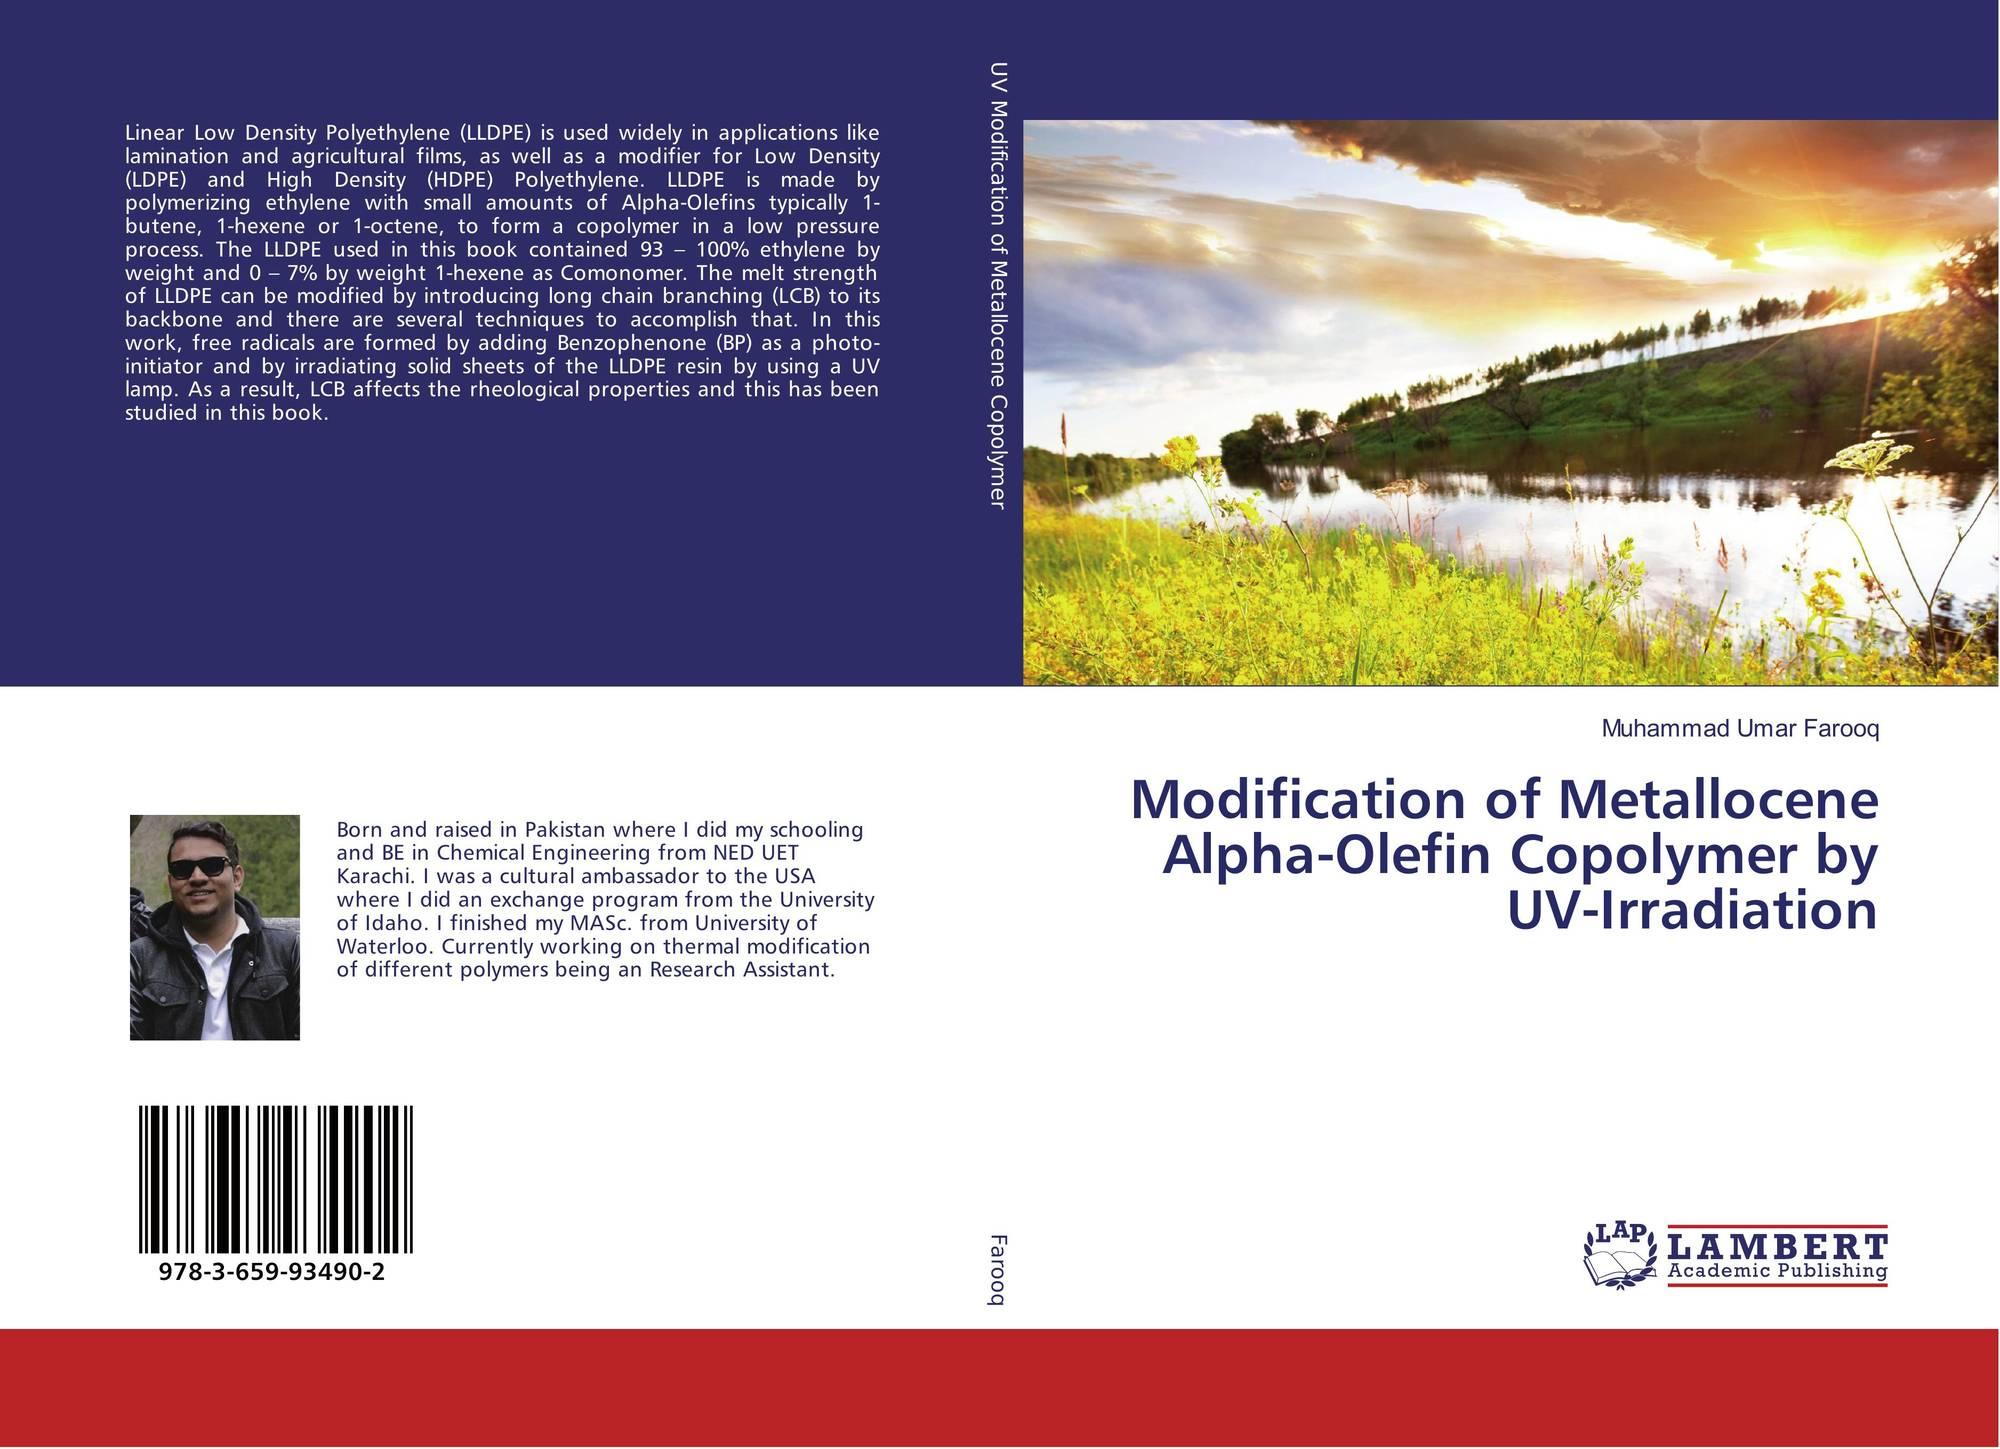 Modification of Metallocene Alpha-Olefin Copolymer by UV-Irradiation